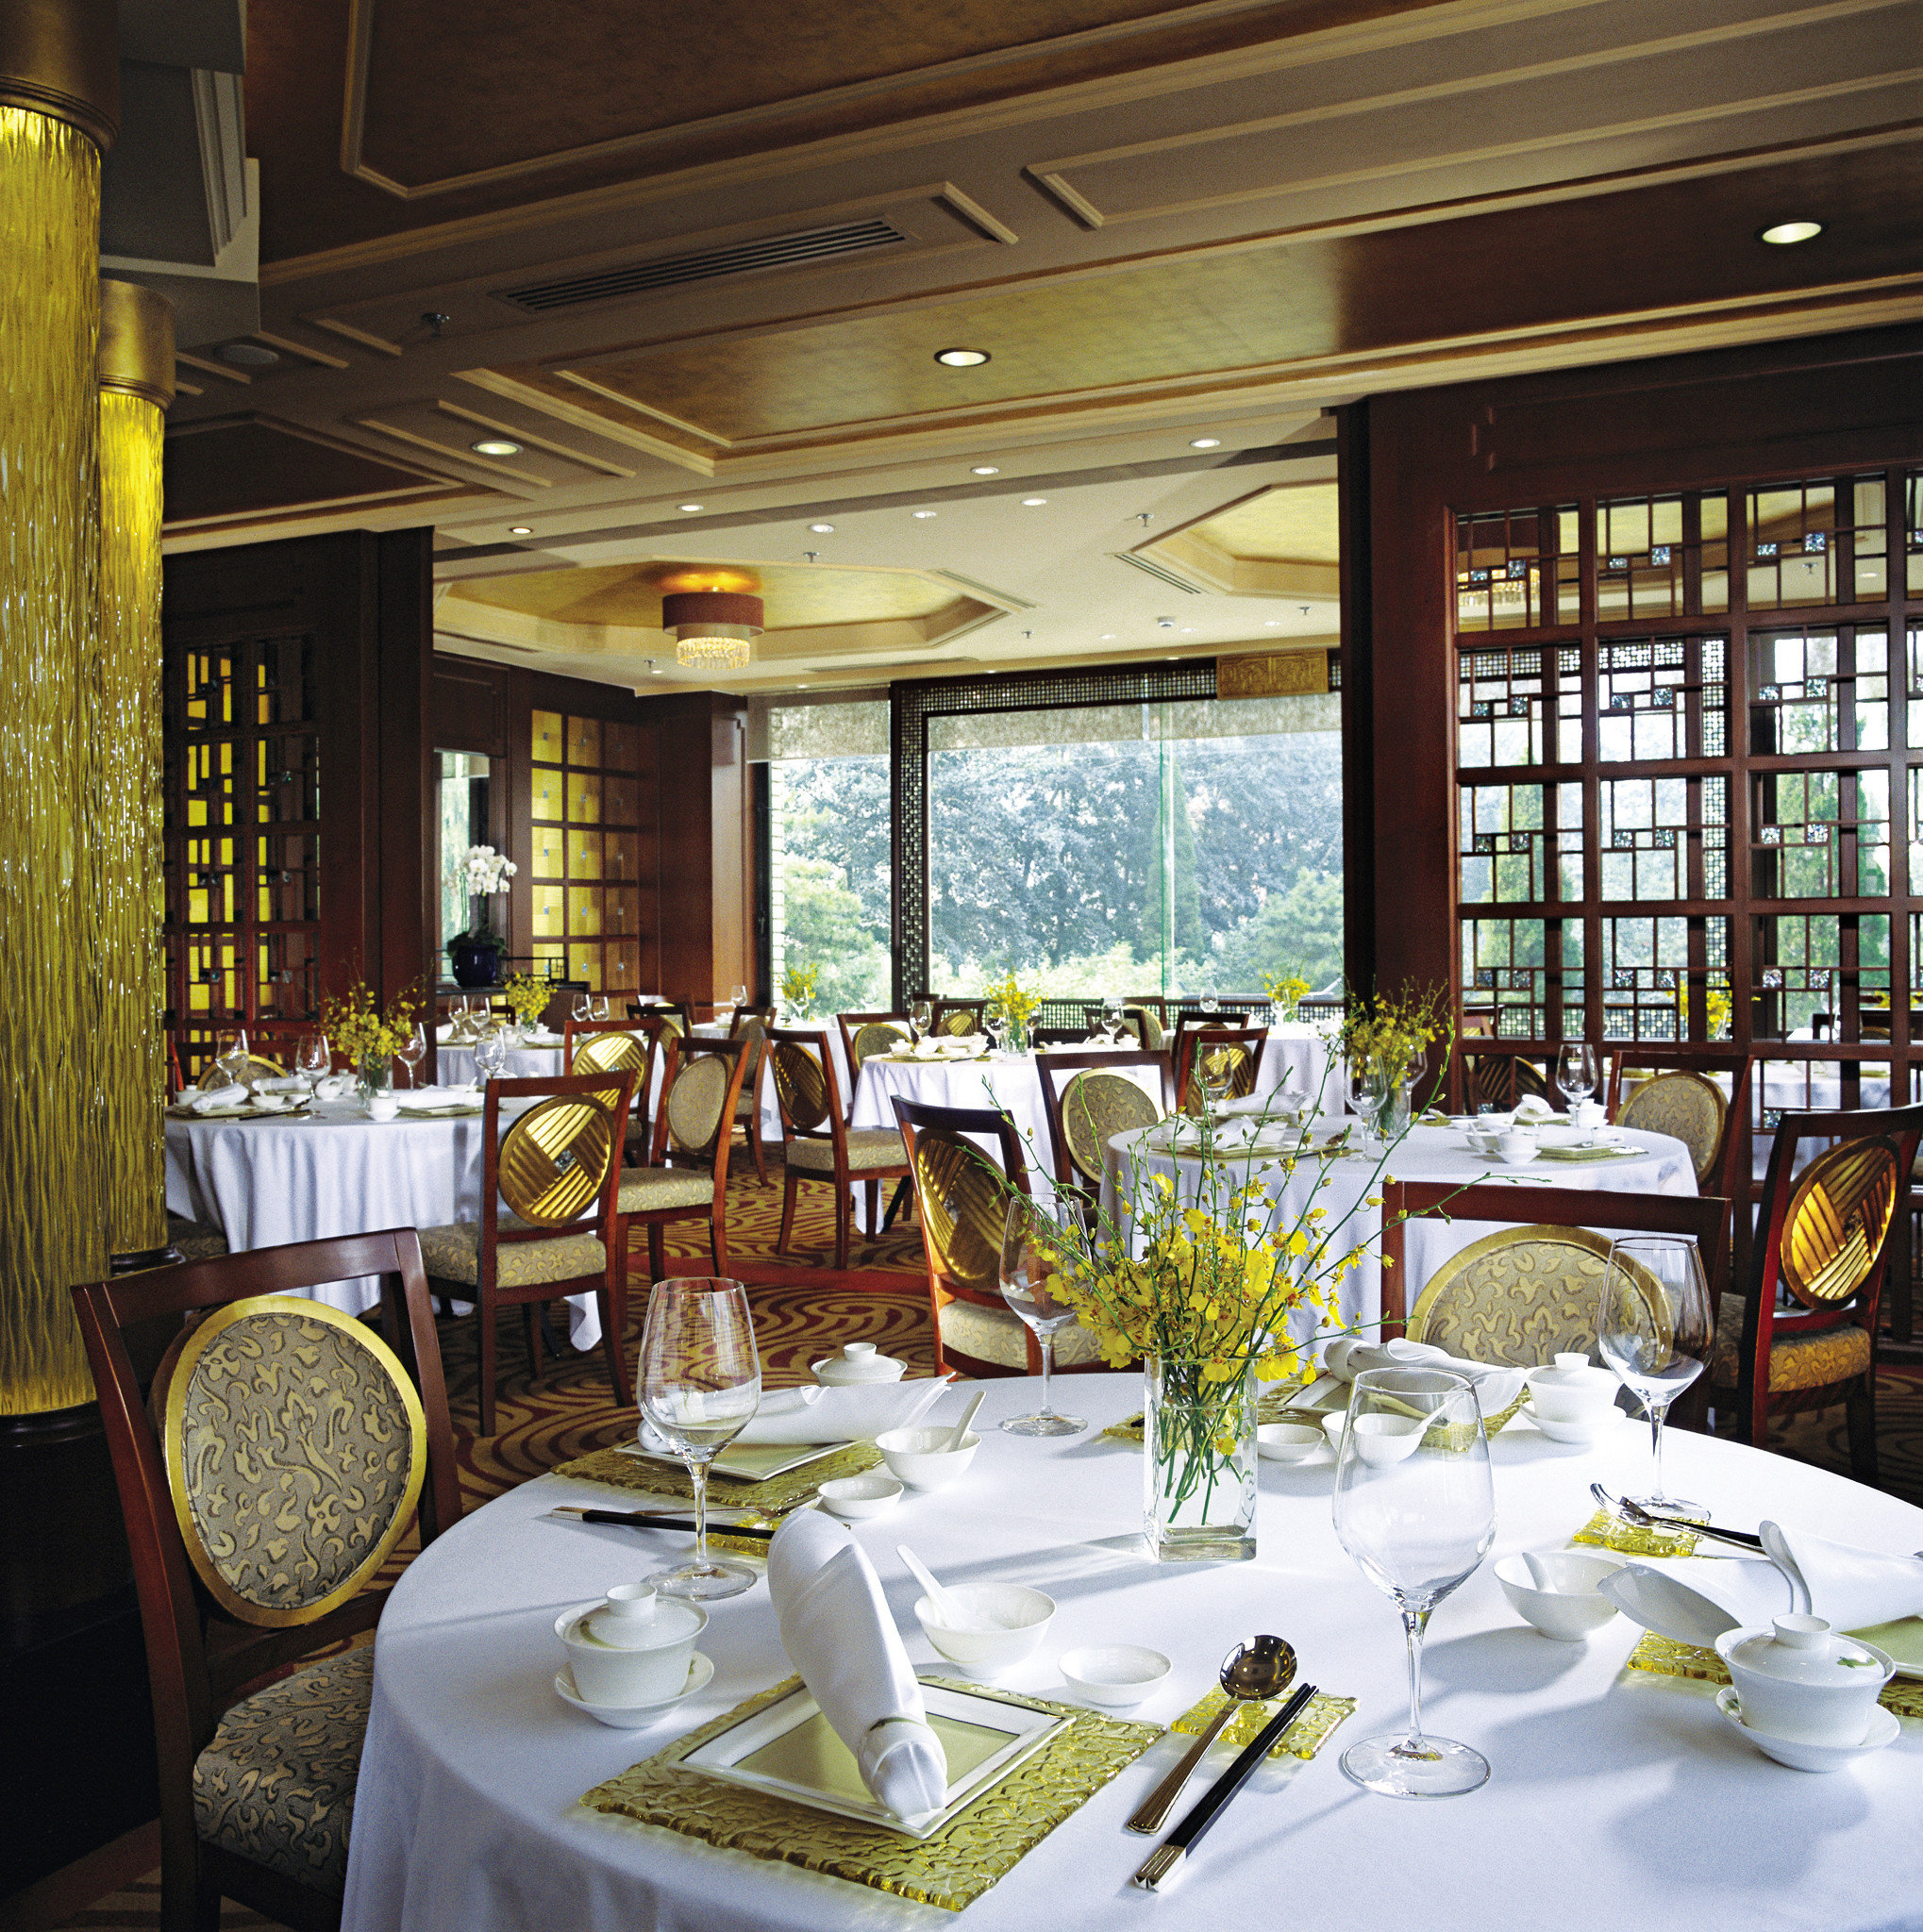 Dining Drink Eat Elegant Luxury Modern restaurant function hall home Resort dining table